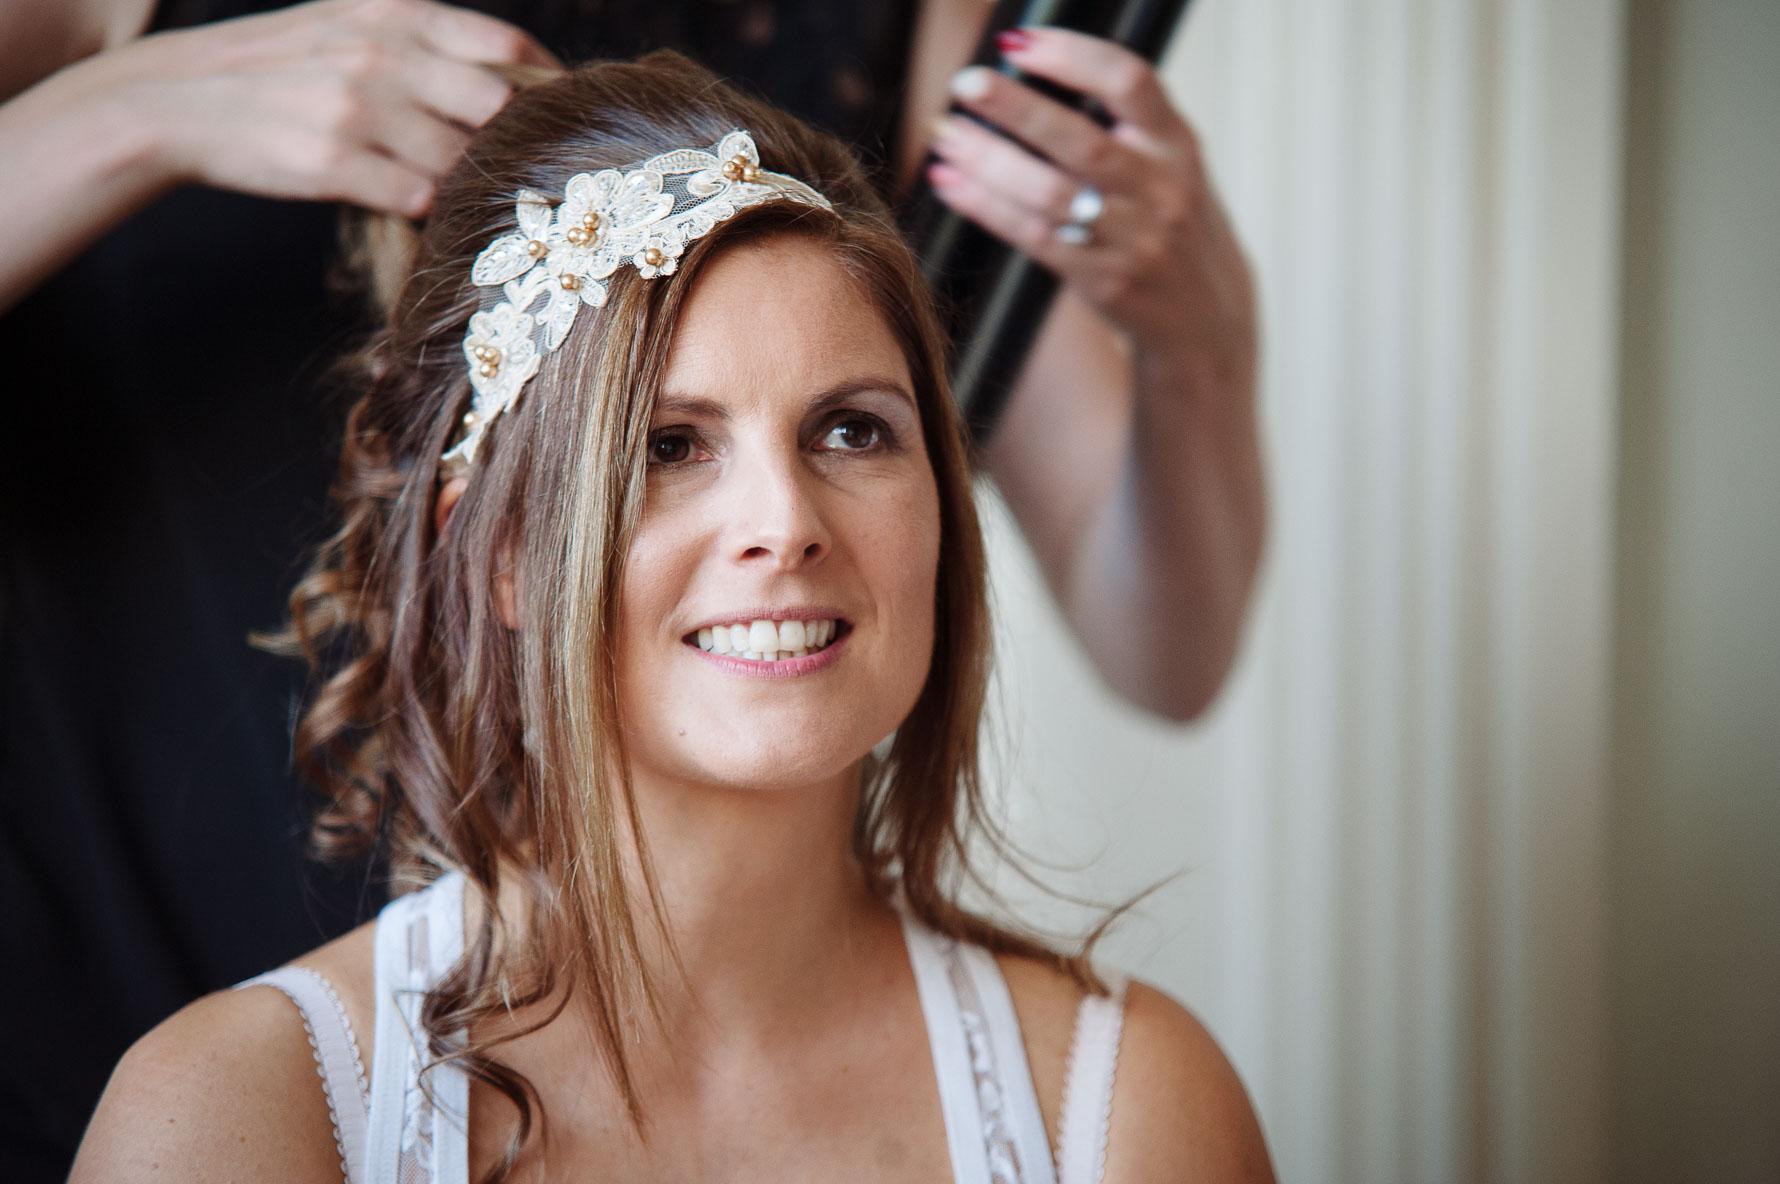 Leeds Castle Wedding3-20140919 0139